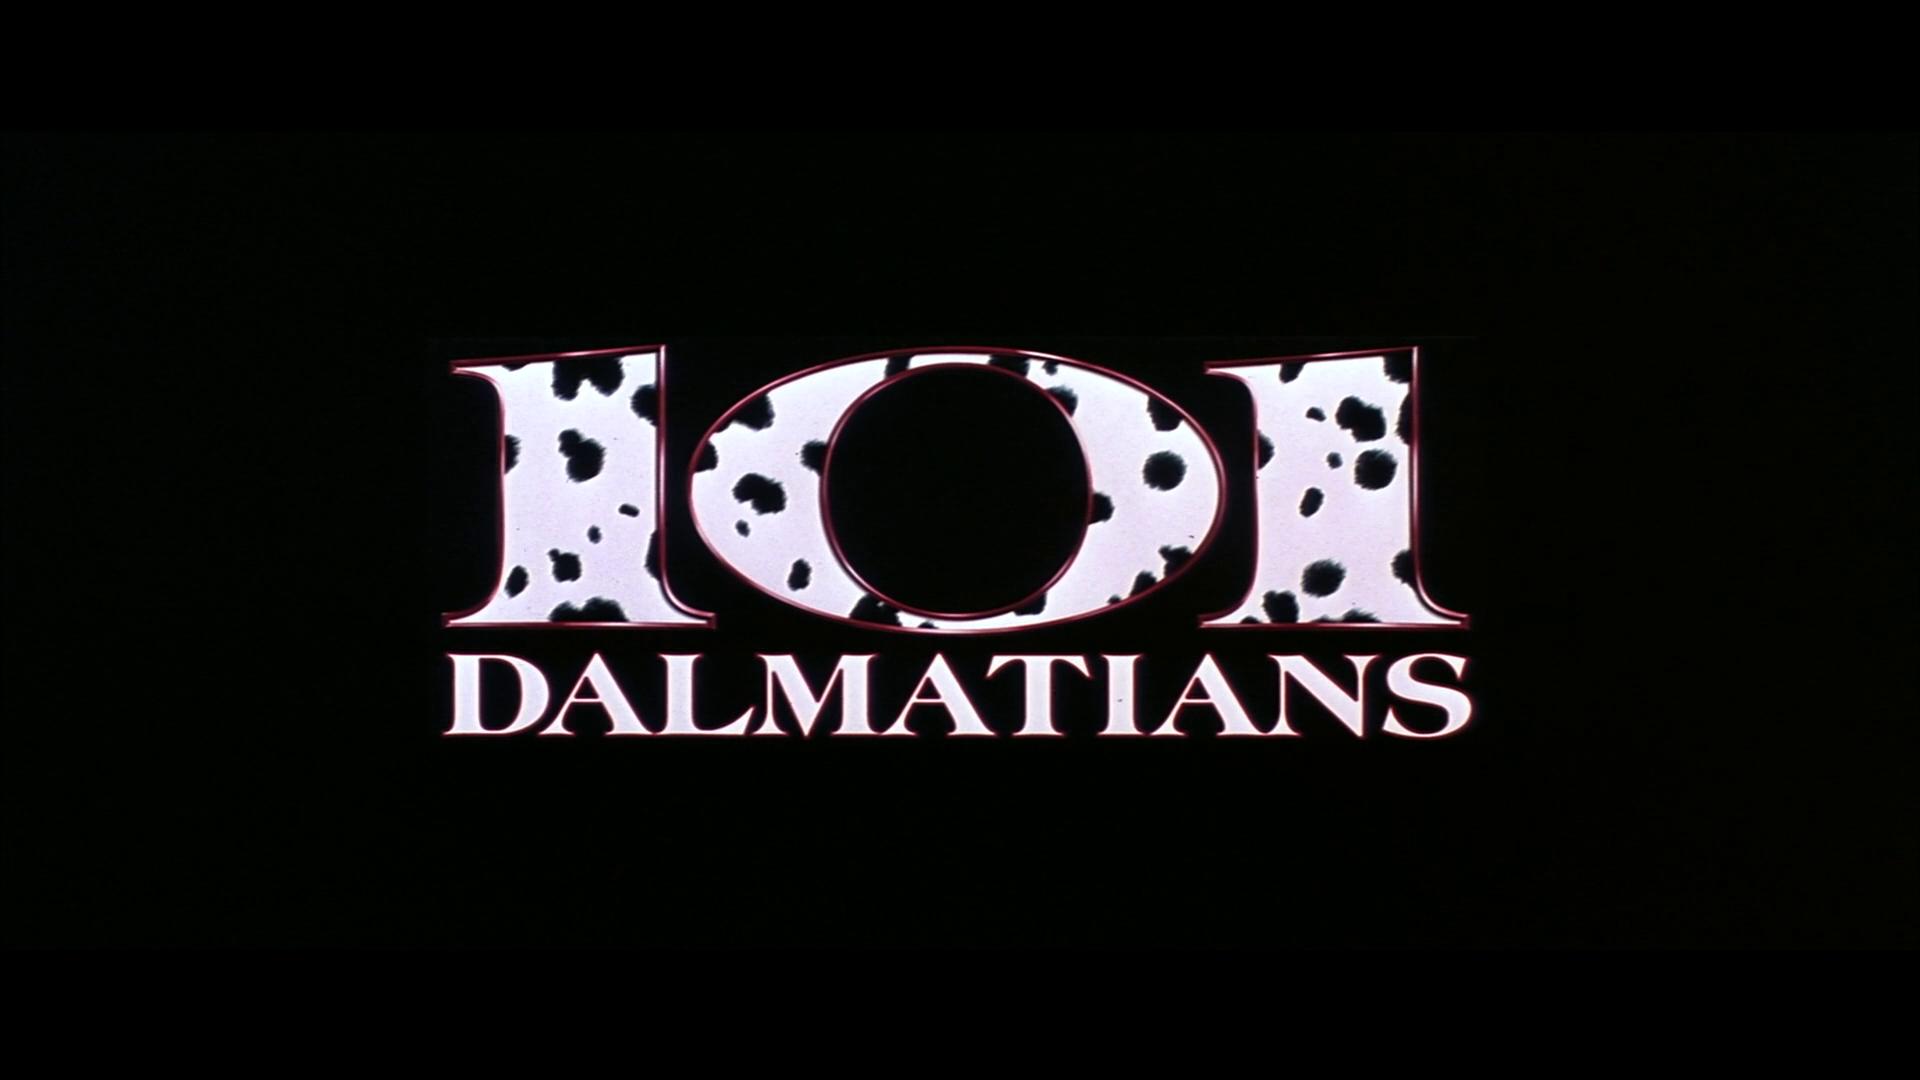 101 dálmatas (1996) 1080p AMZN WEB-DL Latino